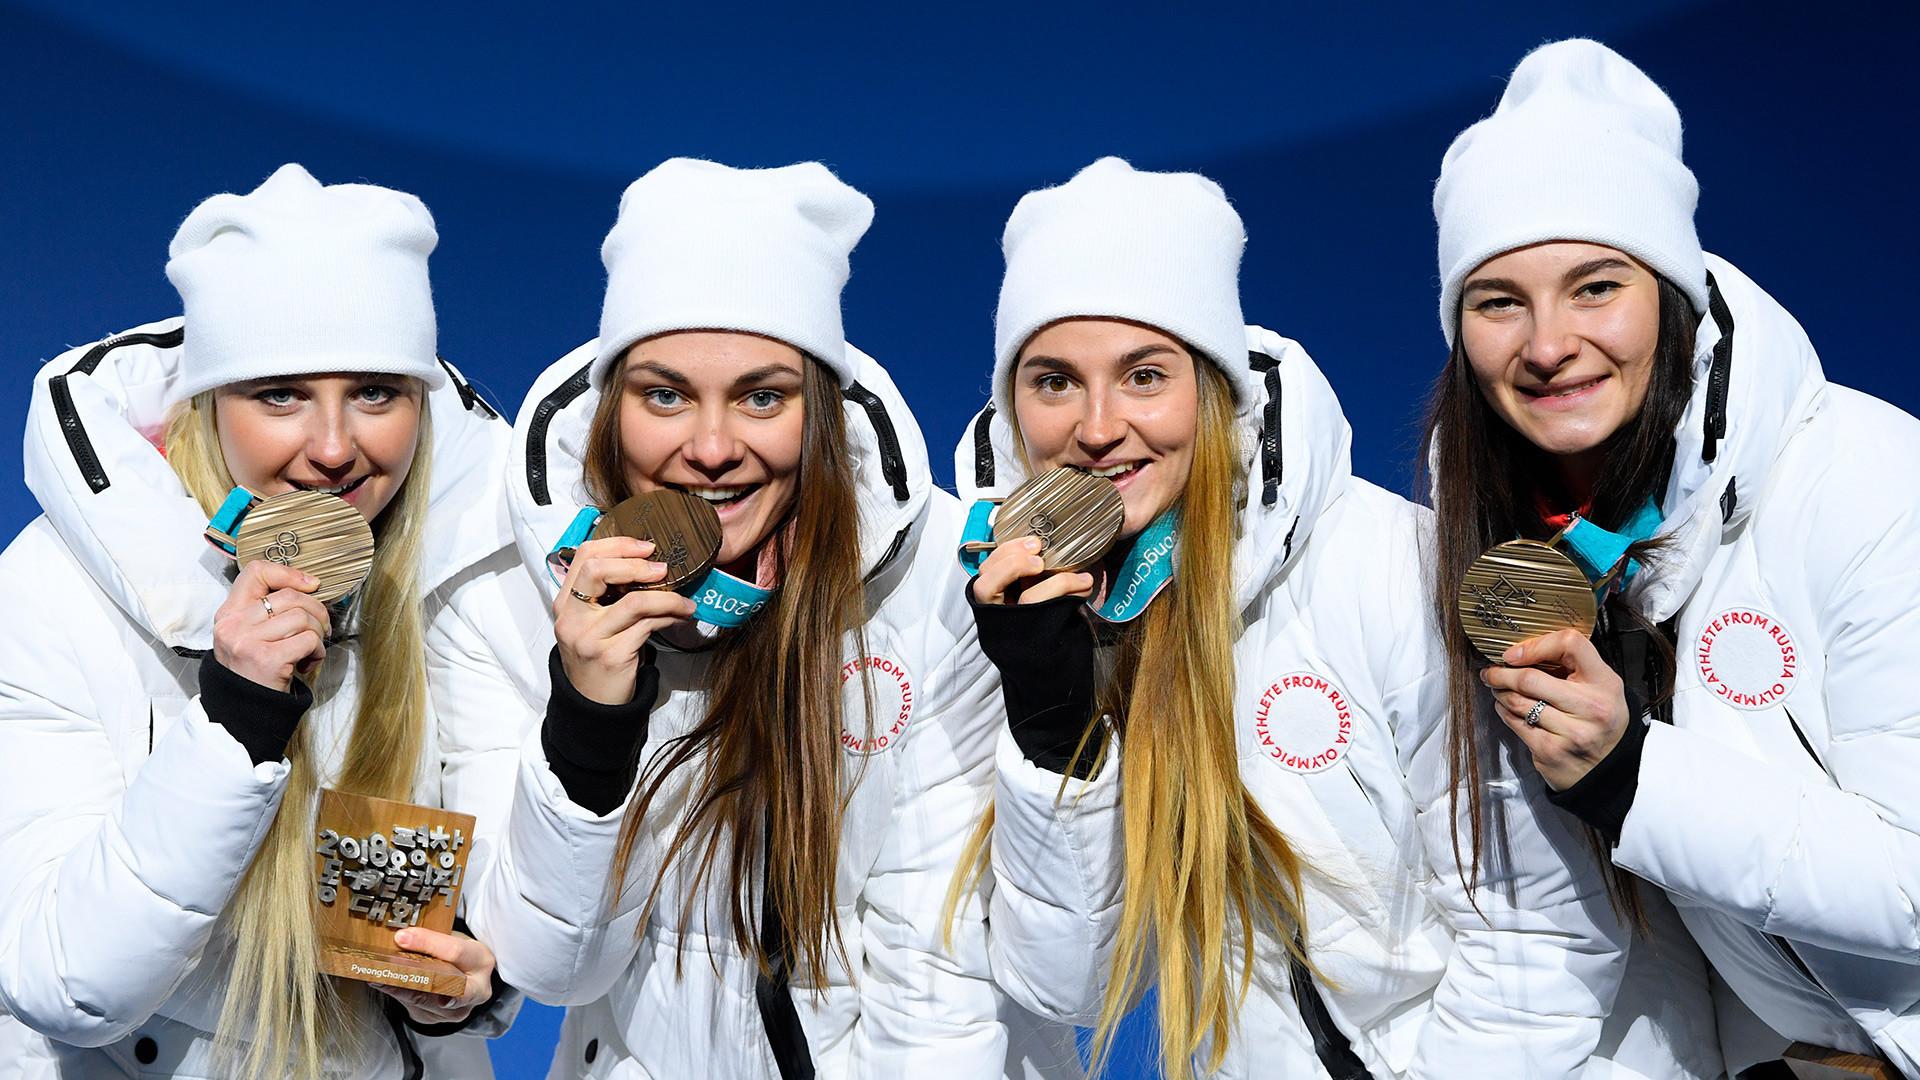 De la izq. a la der.: Natalia Nepriáieva, Yulia Belorúkova, Anastasia Sedova, Anna Necháievskaia